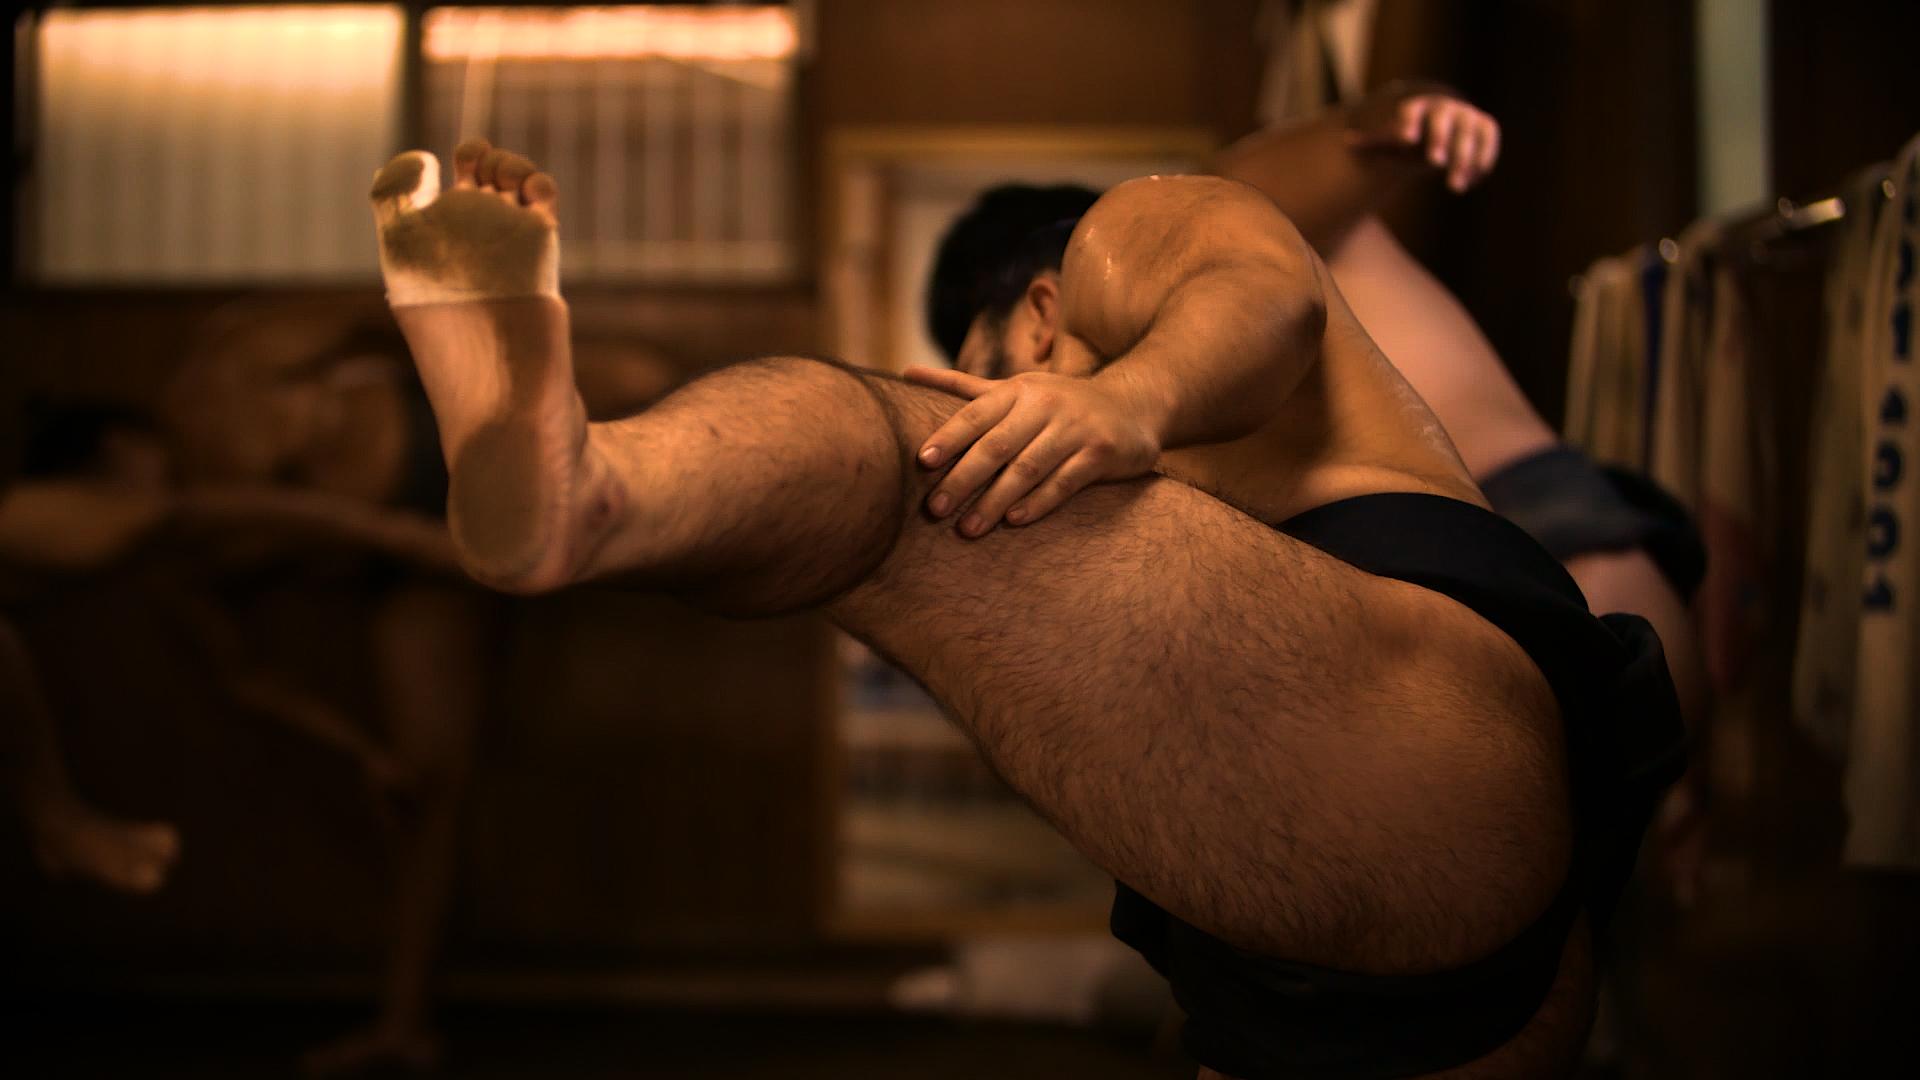 The sumo thigh slap